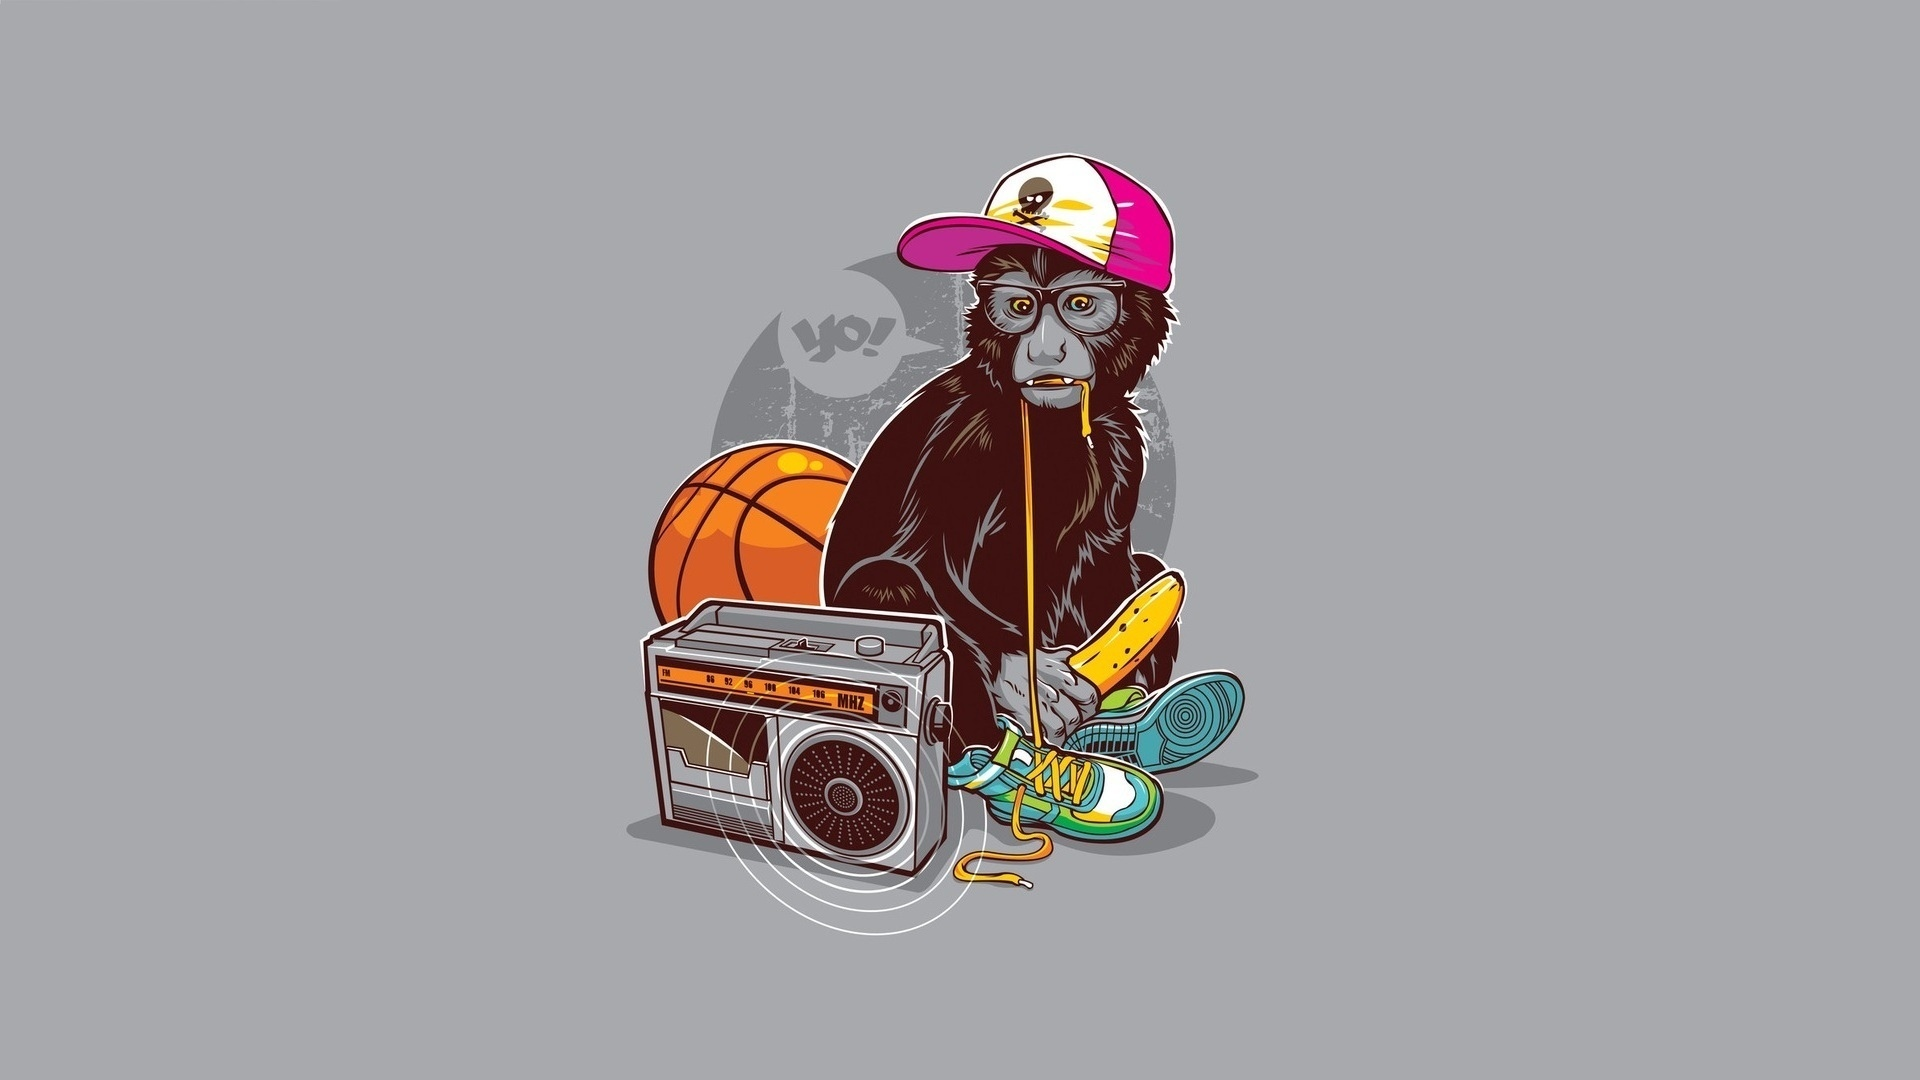 морда обезьяна минимализм muzzle monkey minimalism загрузить